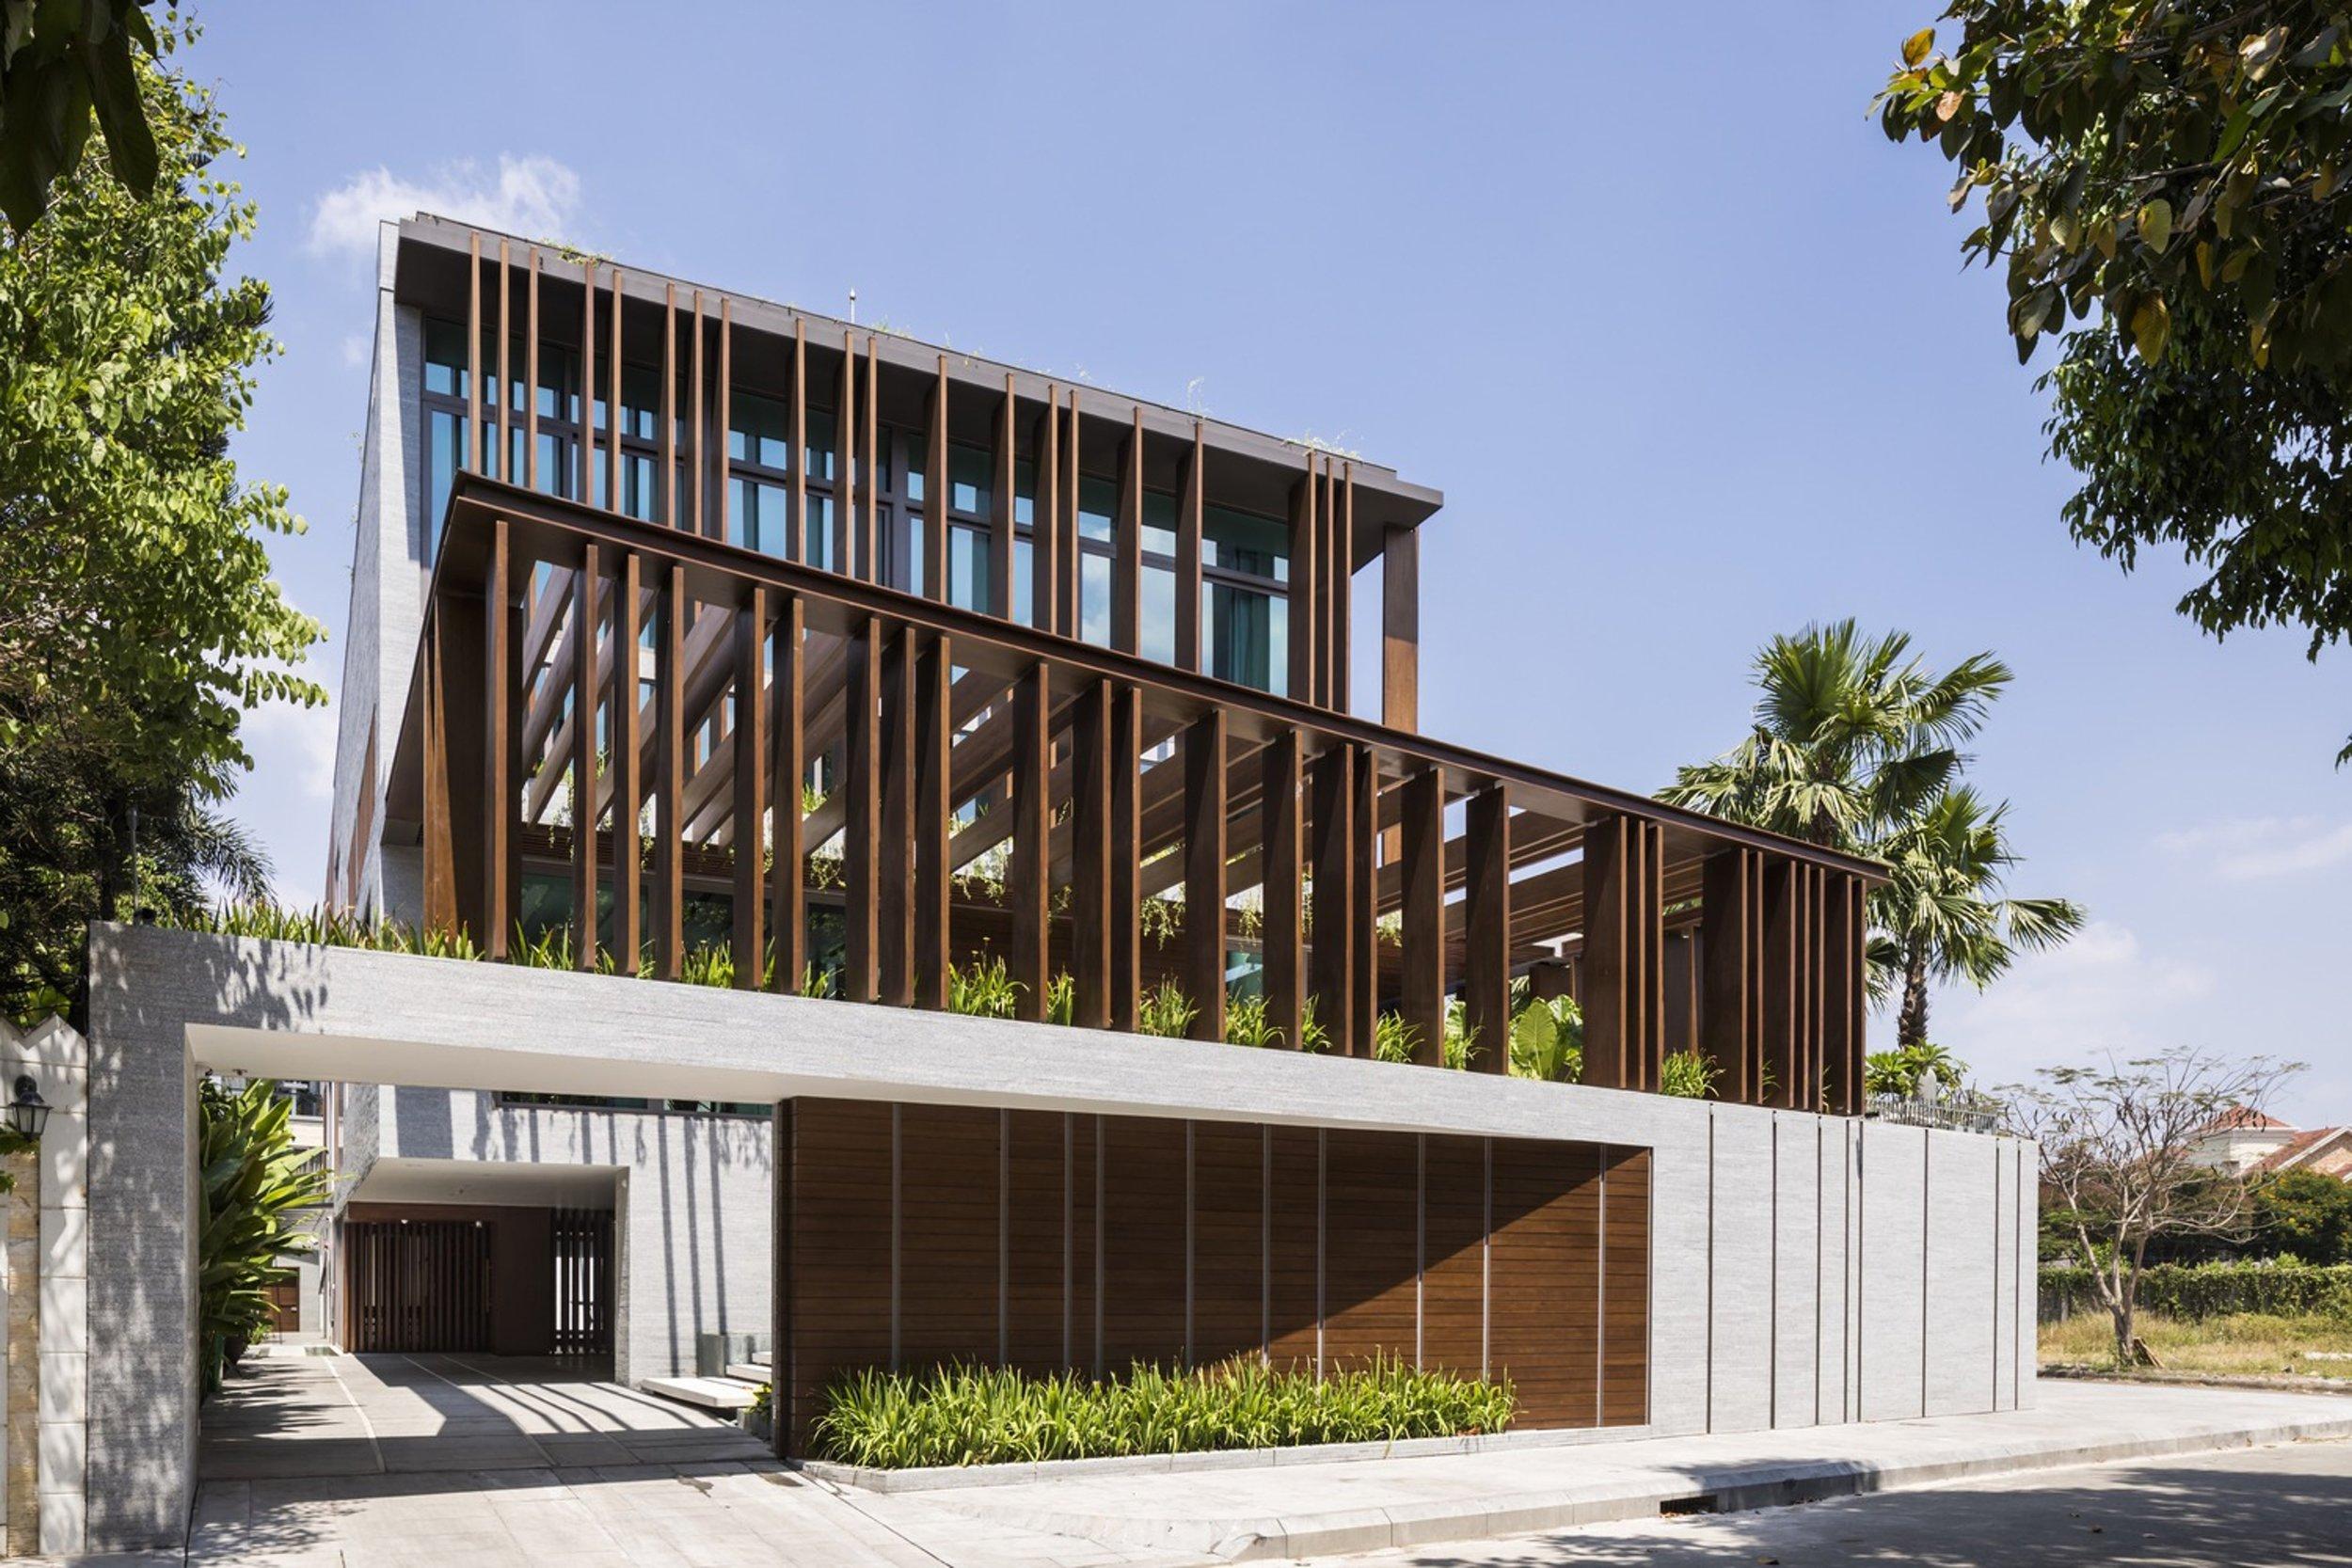 louvers-house-mia-design-studio-1.jpg